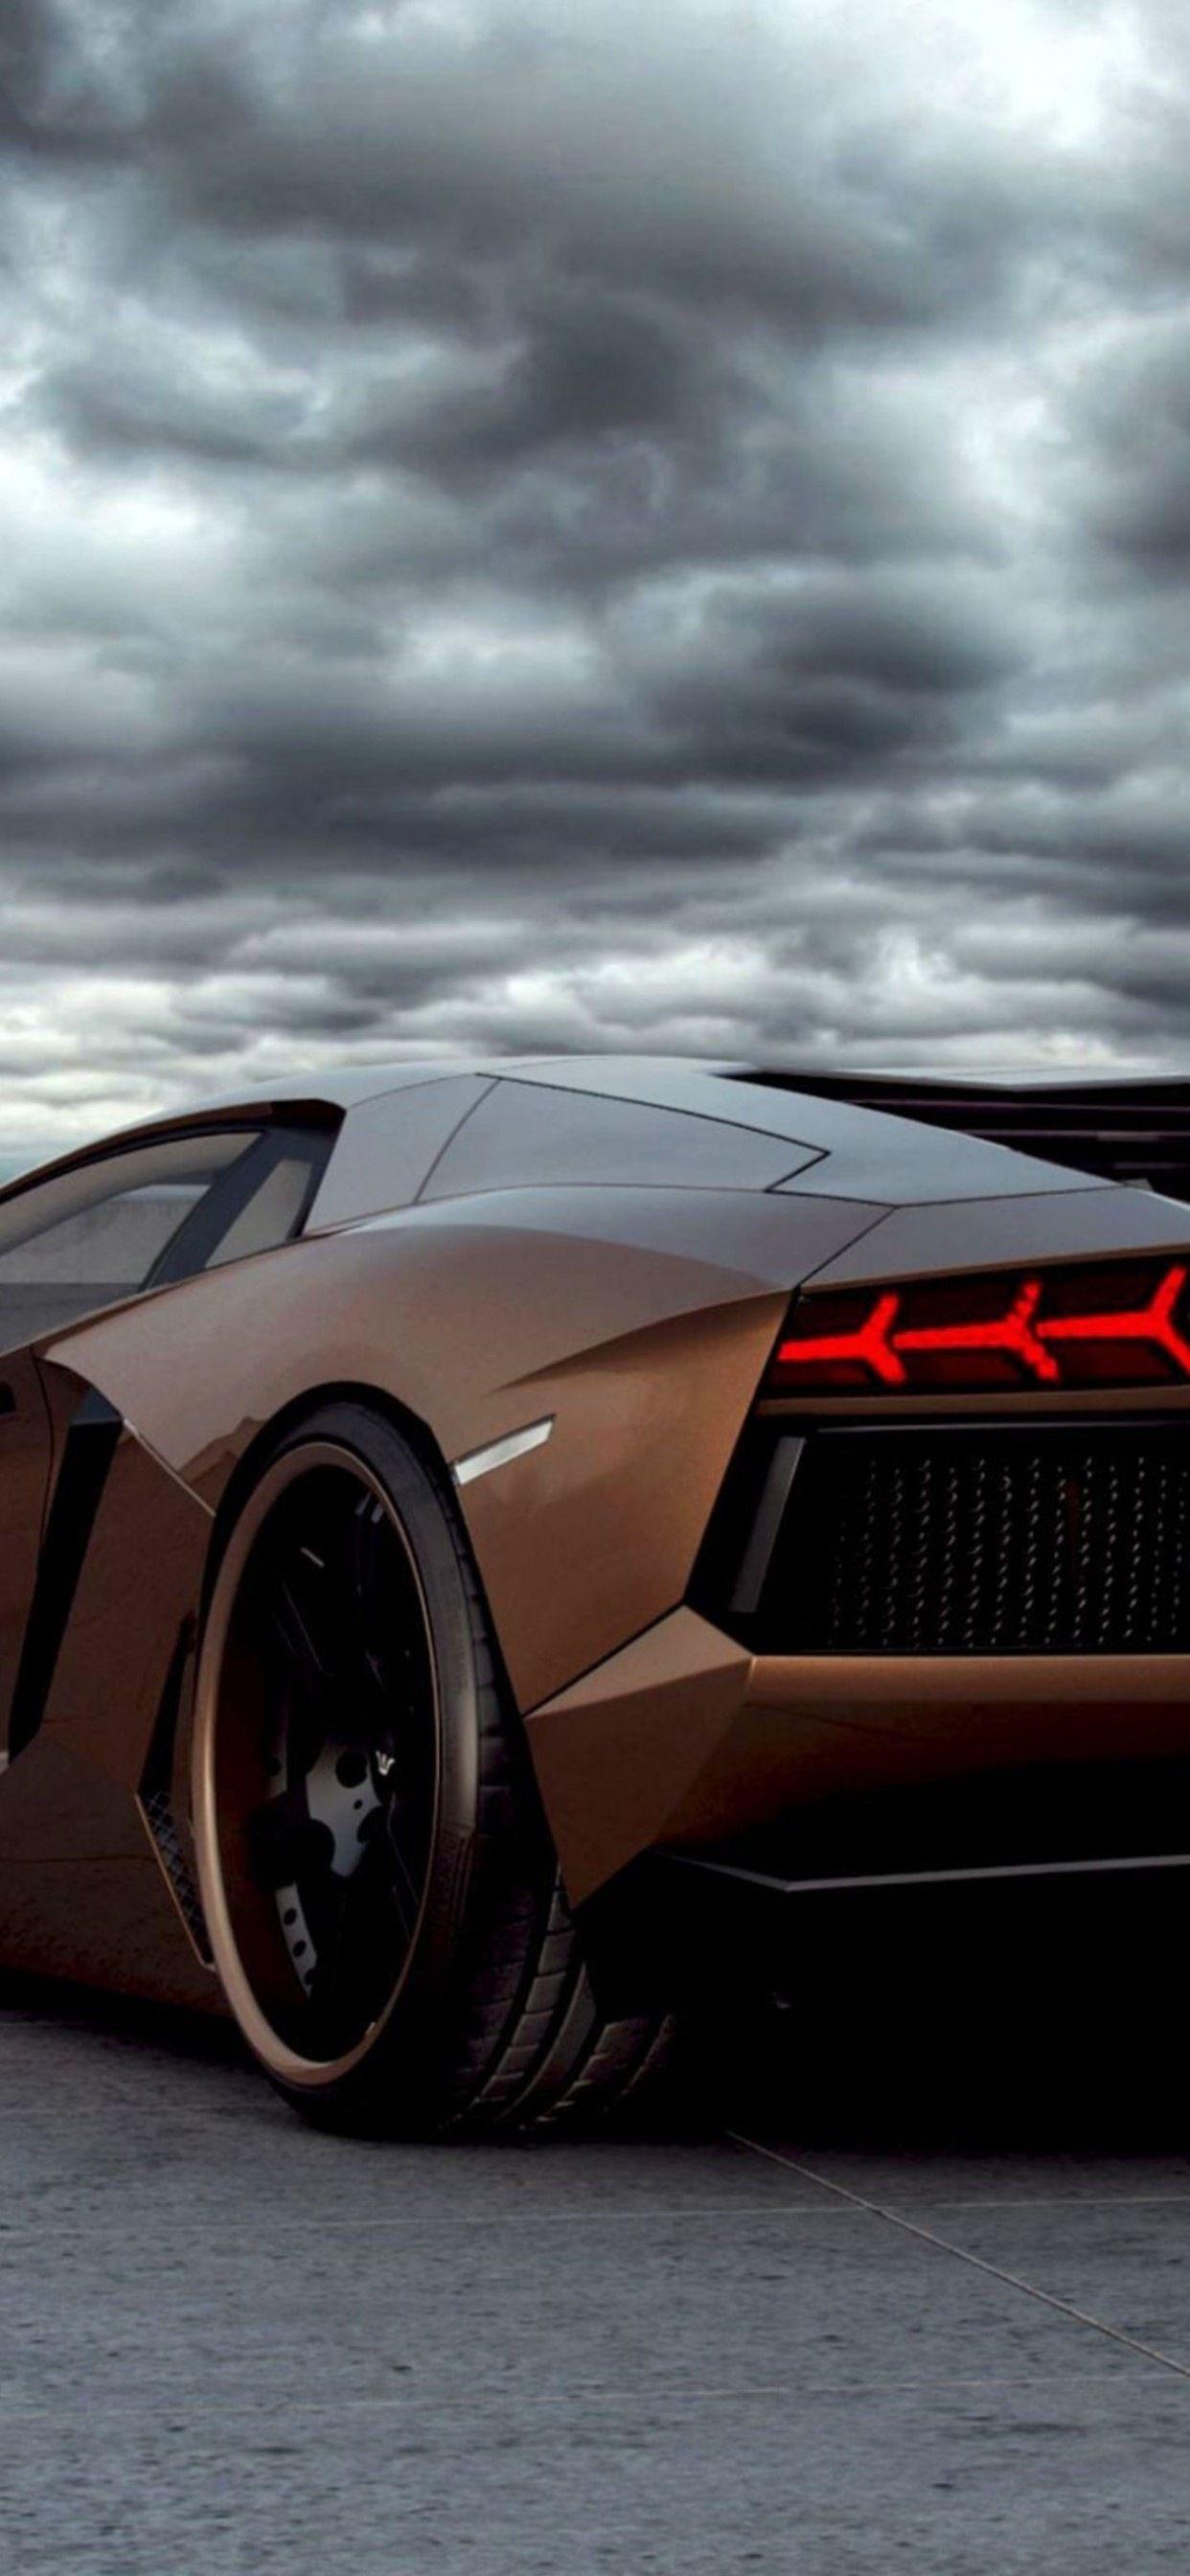 Lamborghini Cars Mobile Full Hd Wallpapers 1242x2688 Full Hd Wallpaper Hd Wallpaper Super Cars